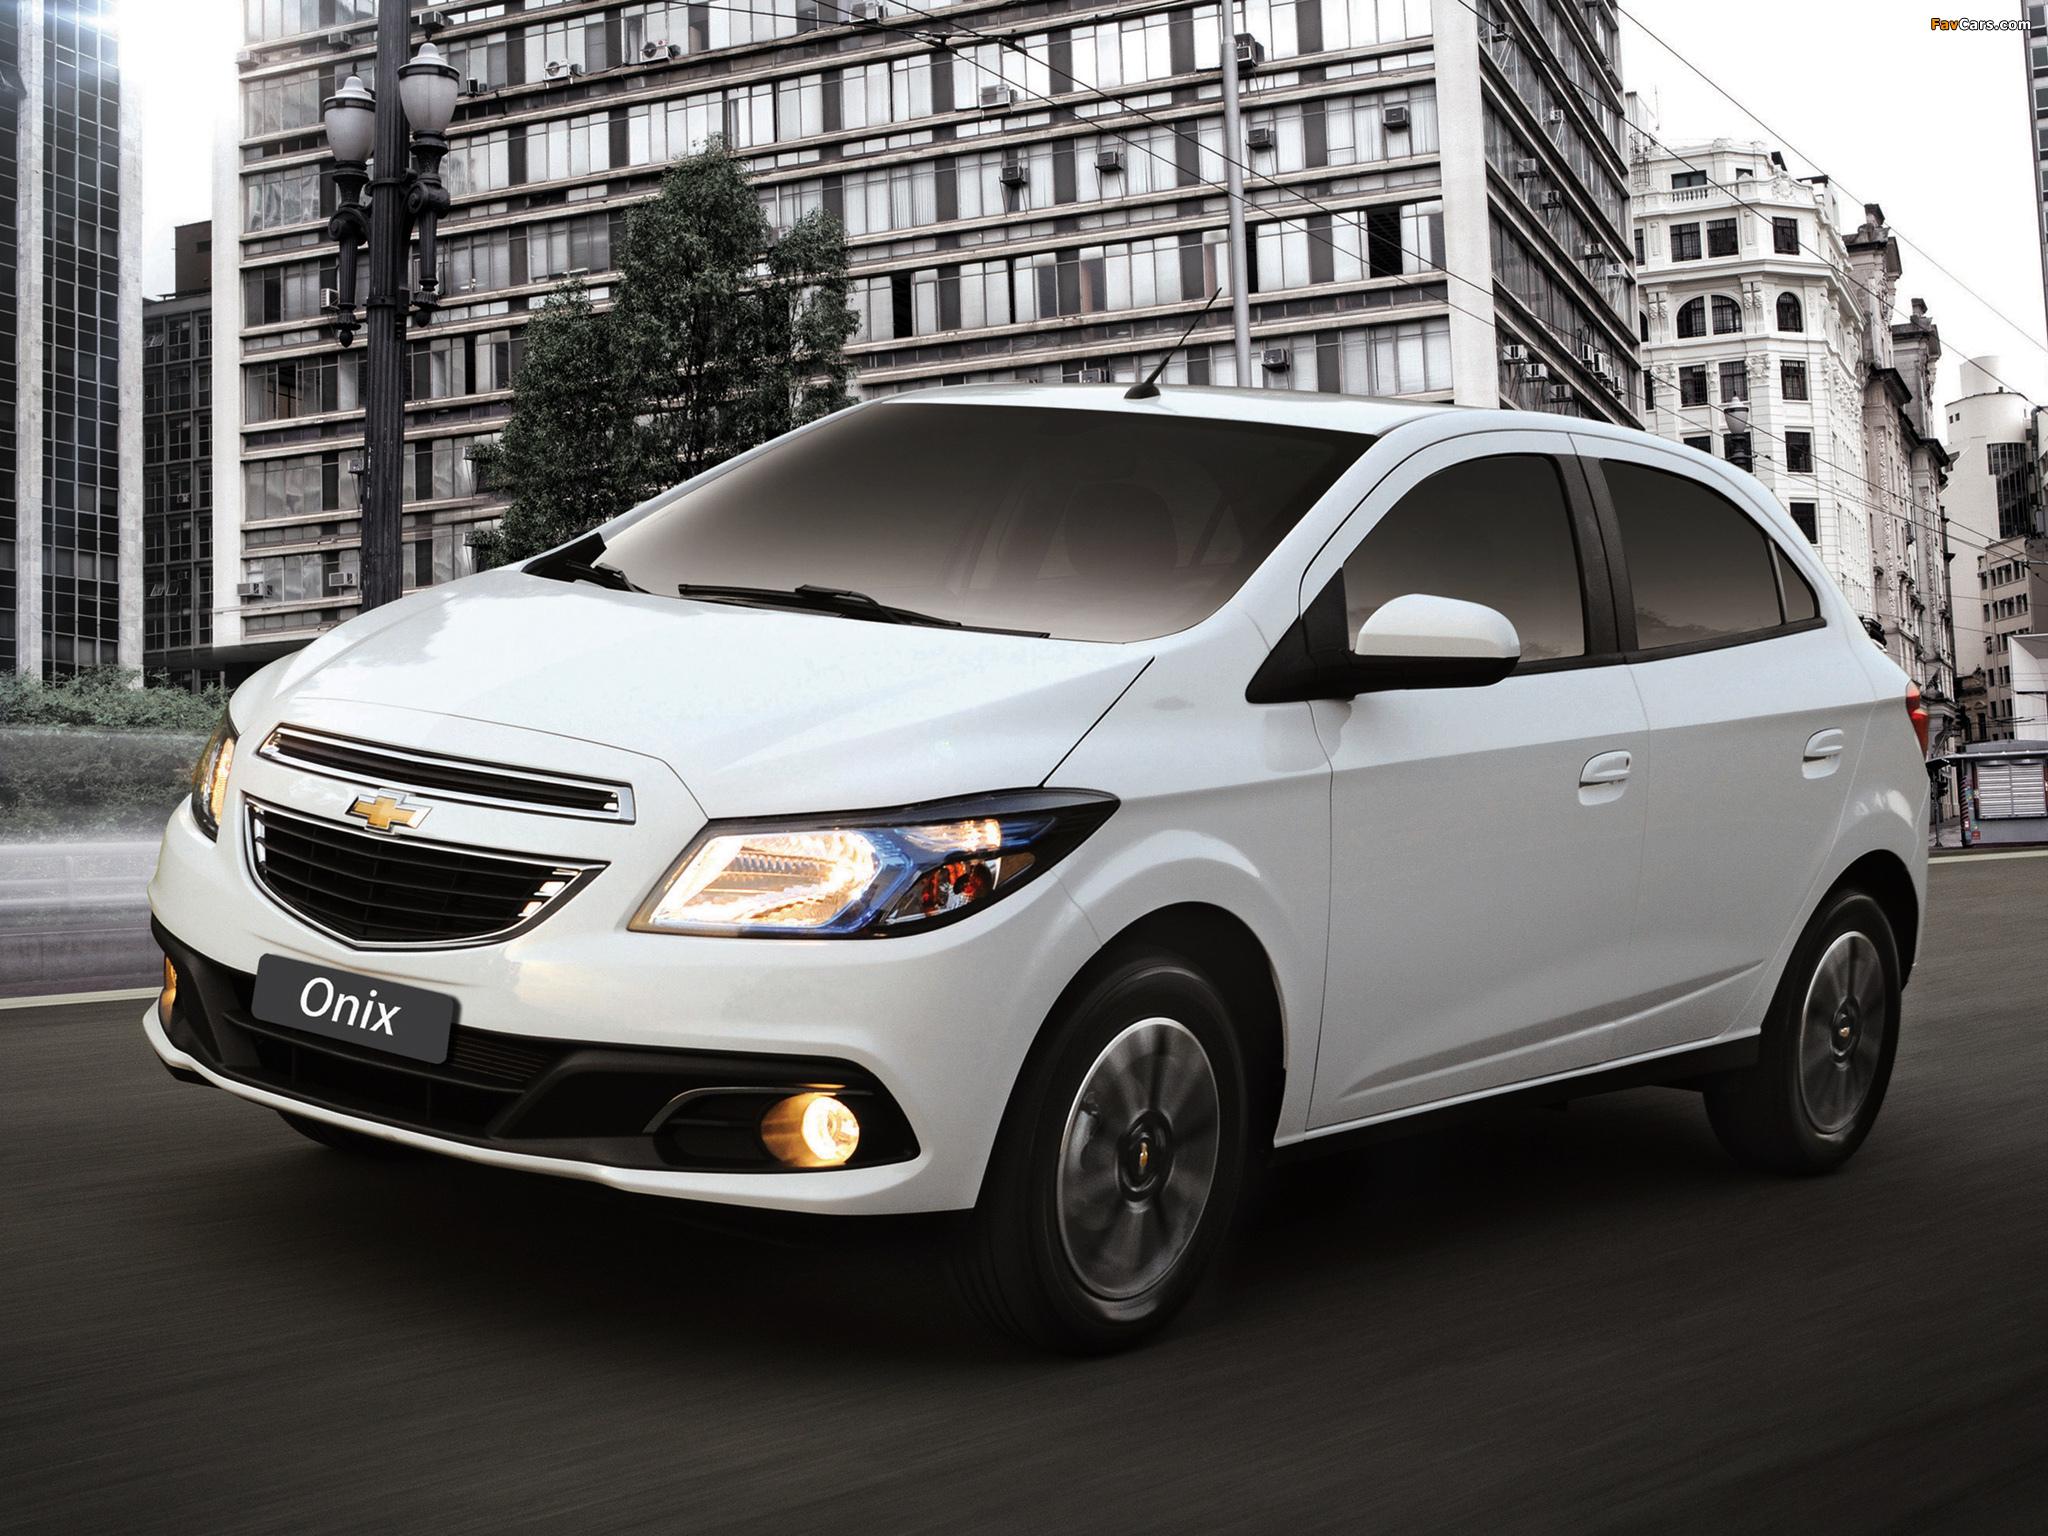 Chevrolet Onix 2012 pictures (2048 x 1536)